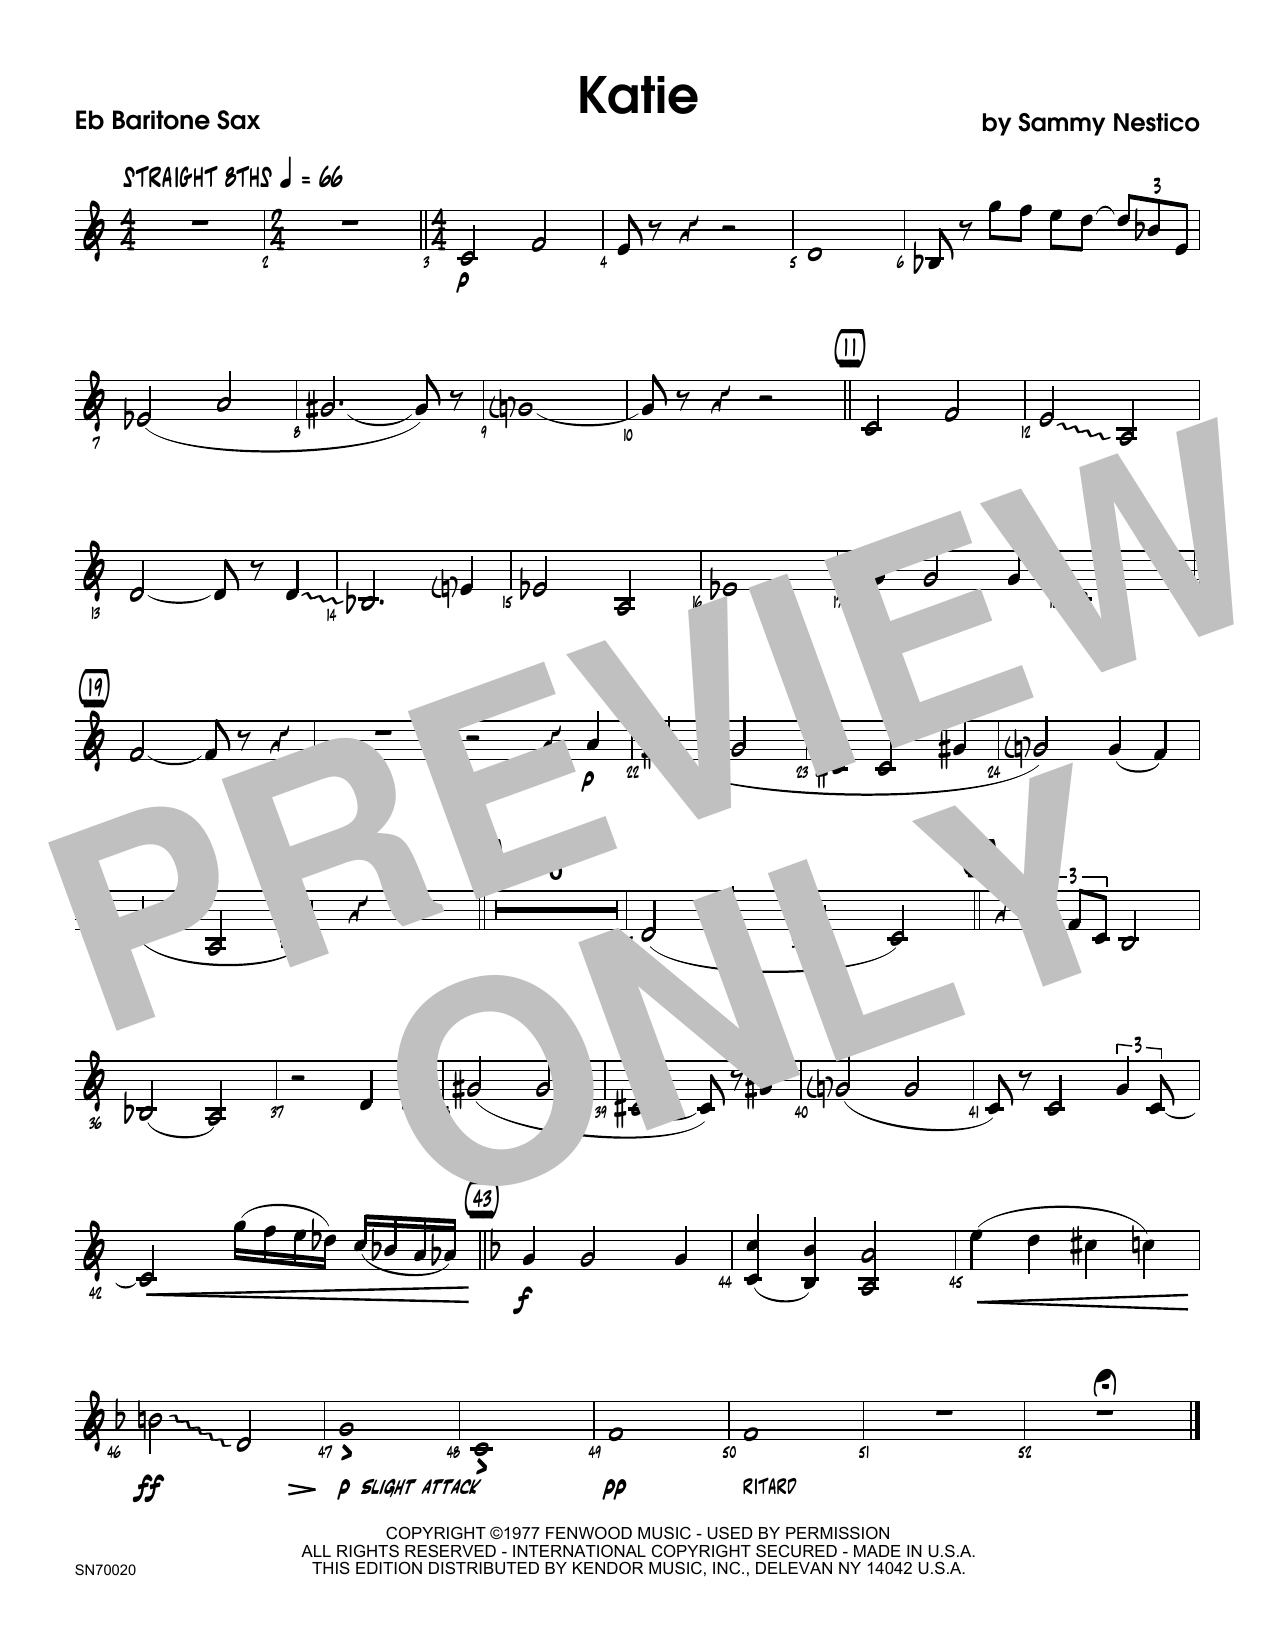 Katie - Eb Baritone Saxophone Sheet Music